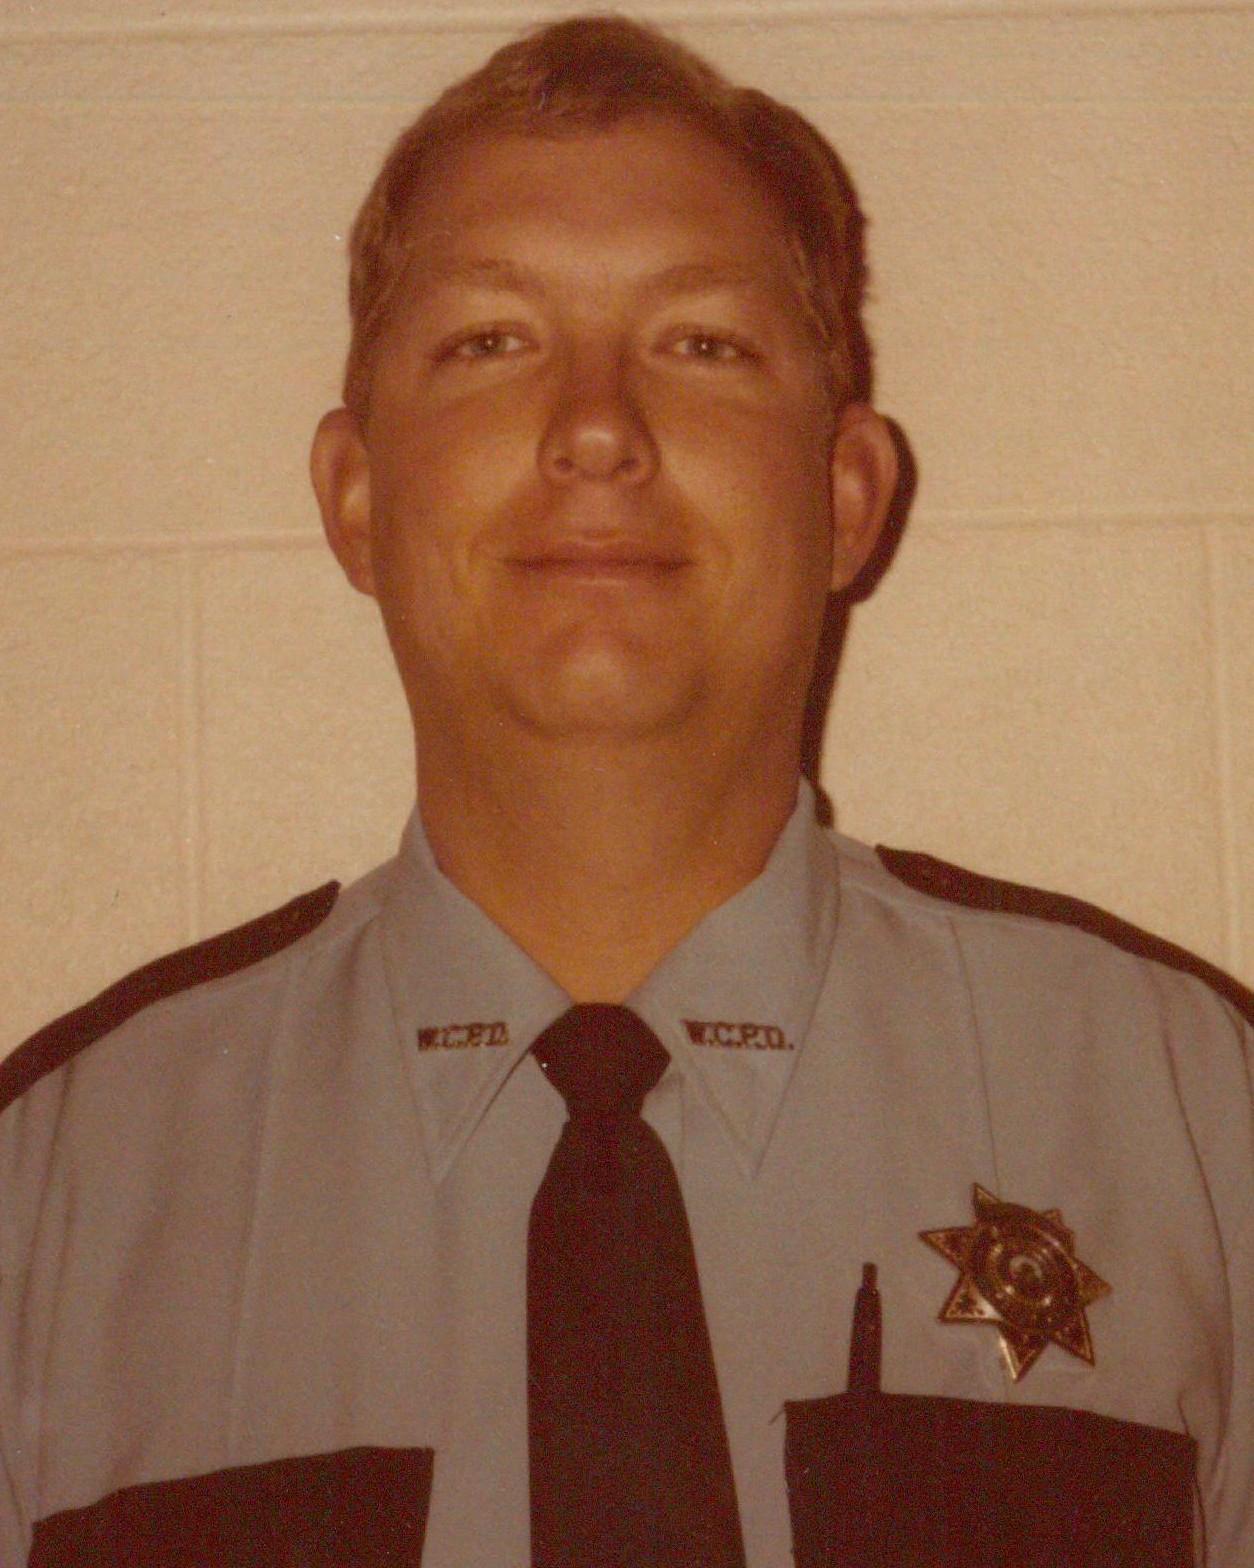 Senior Patrol Officer Keith Allen Braddock | Watford City Police Department, North Dakota